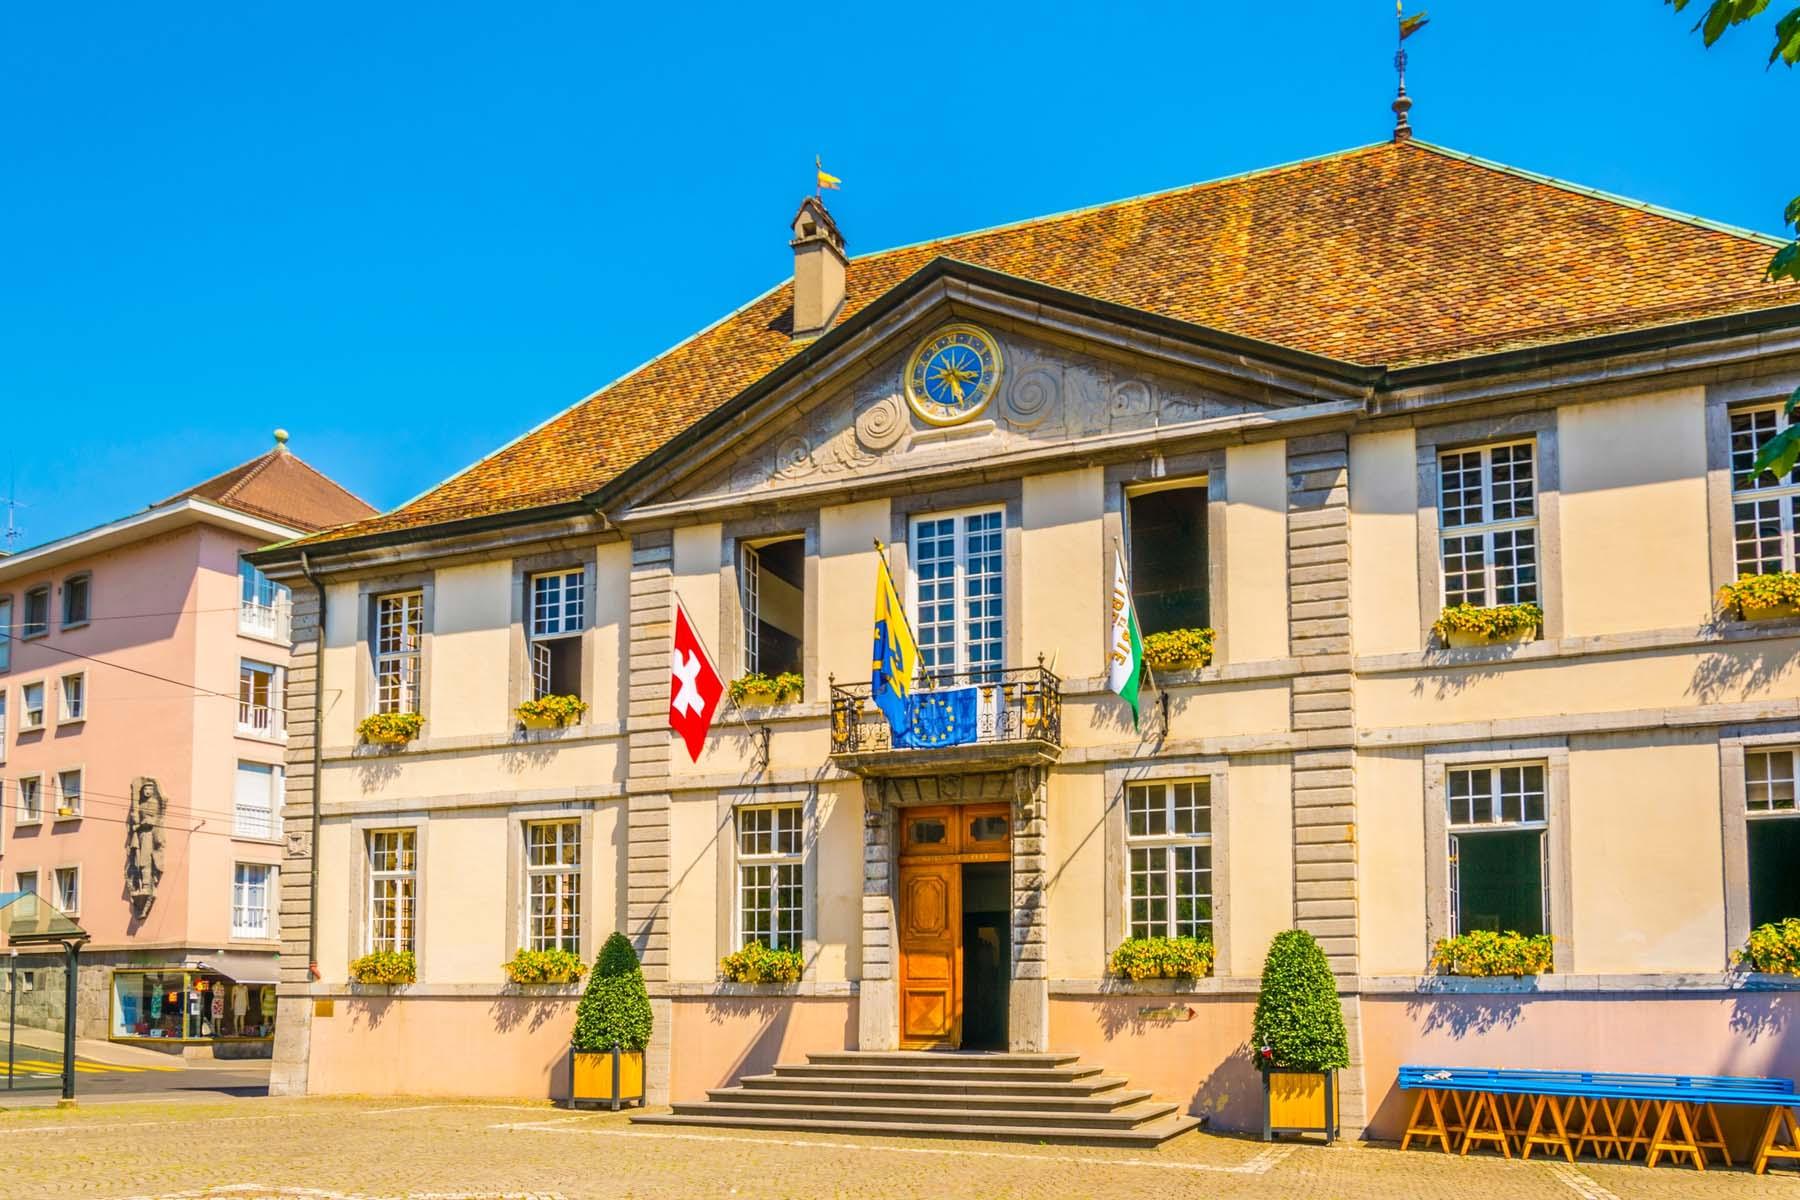 Swiss town hall